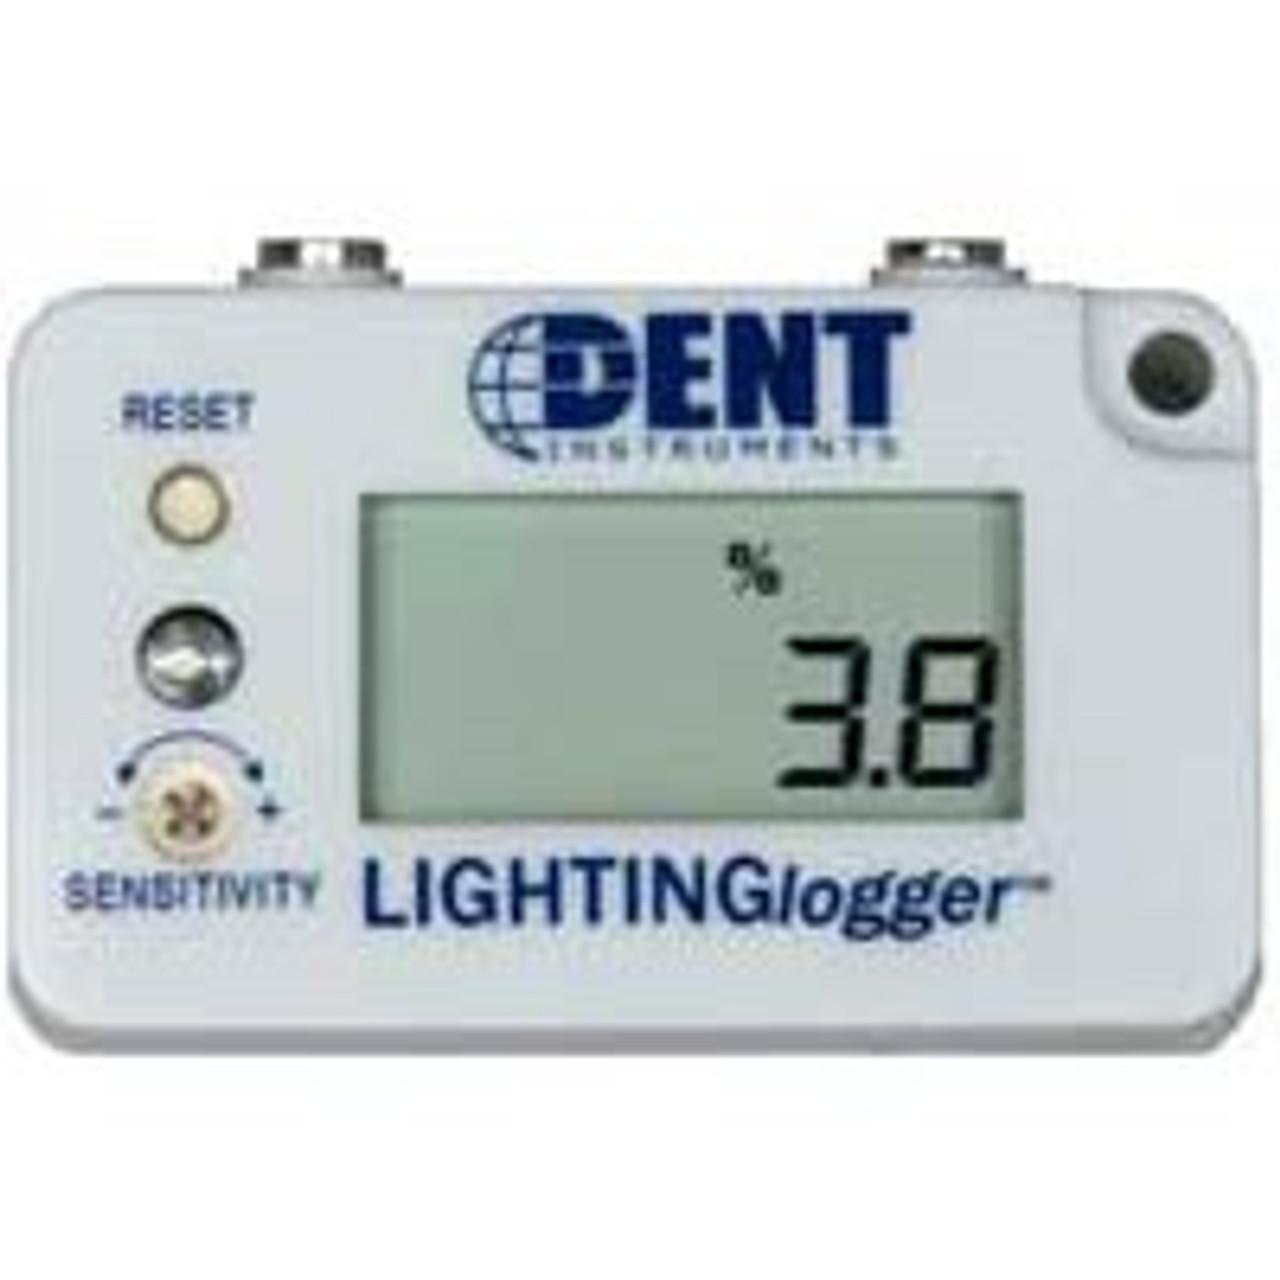 Dent Instruments LIGHTINGlogger TOUL-4G data logger.